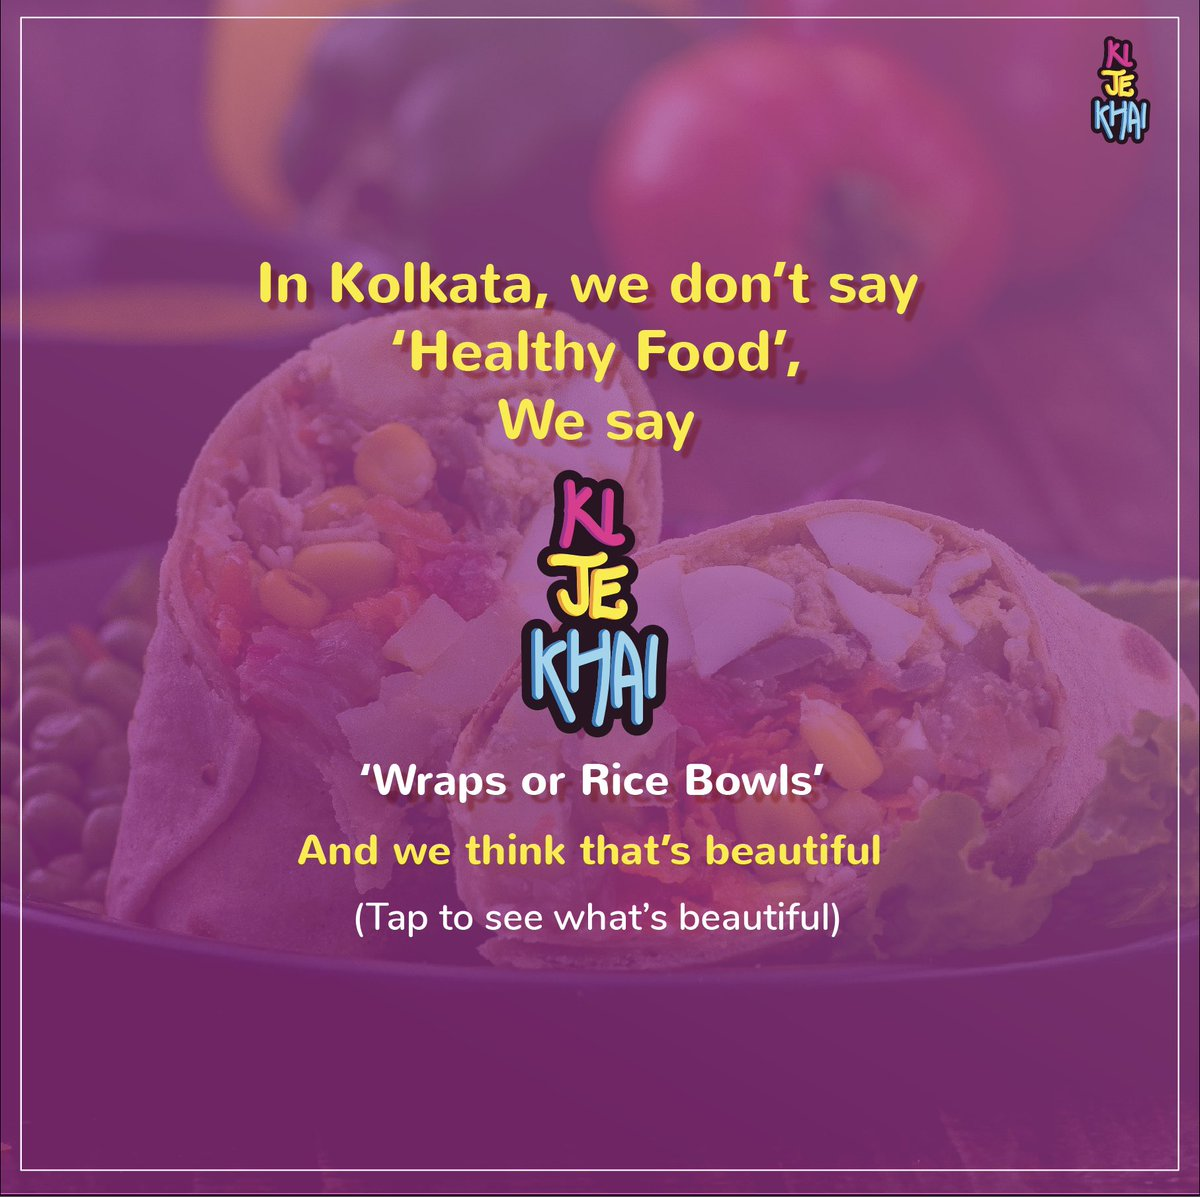 Healthy food, did you say? 🧐  #thatsbeautiful . #food #wraps #ricebowls #love #healthy #healthyfood #tasty #healthylifestyle #veggie #kolkata #trending https://t.co/RhgP3YOdil